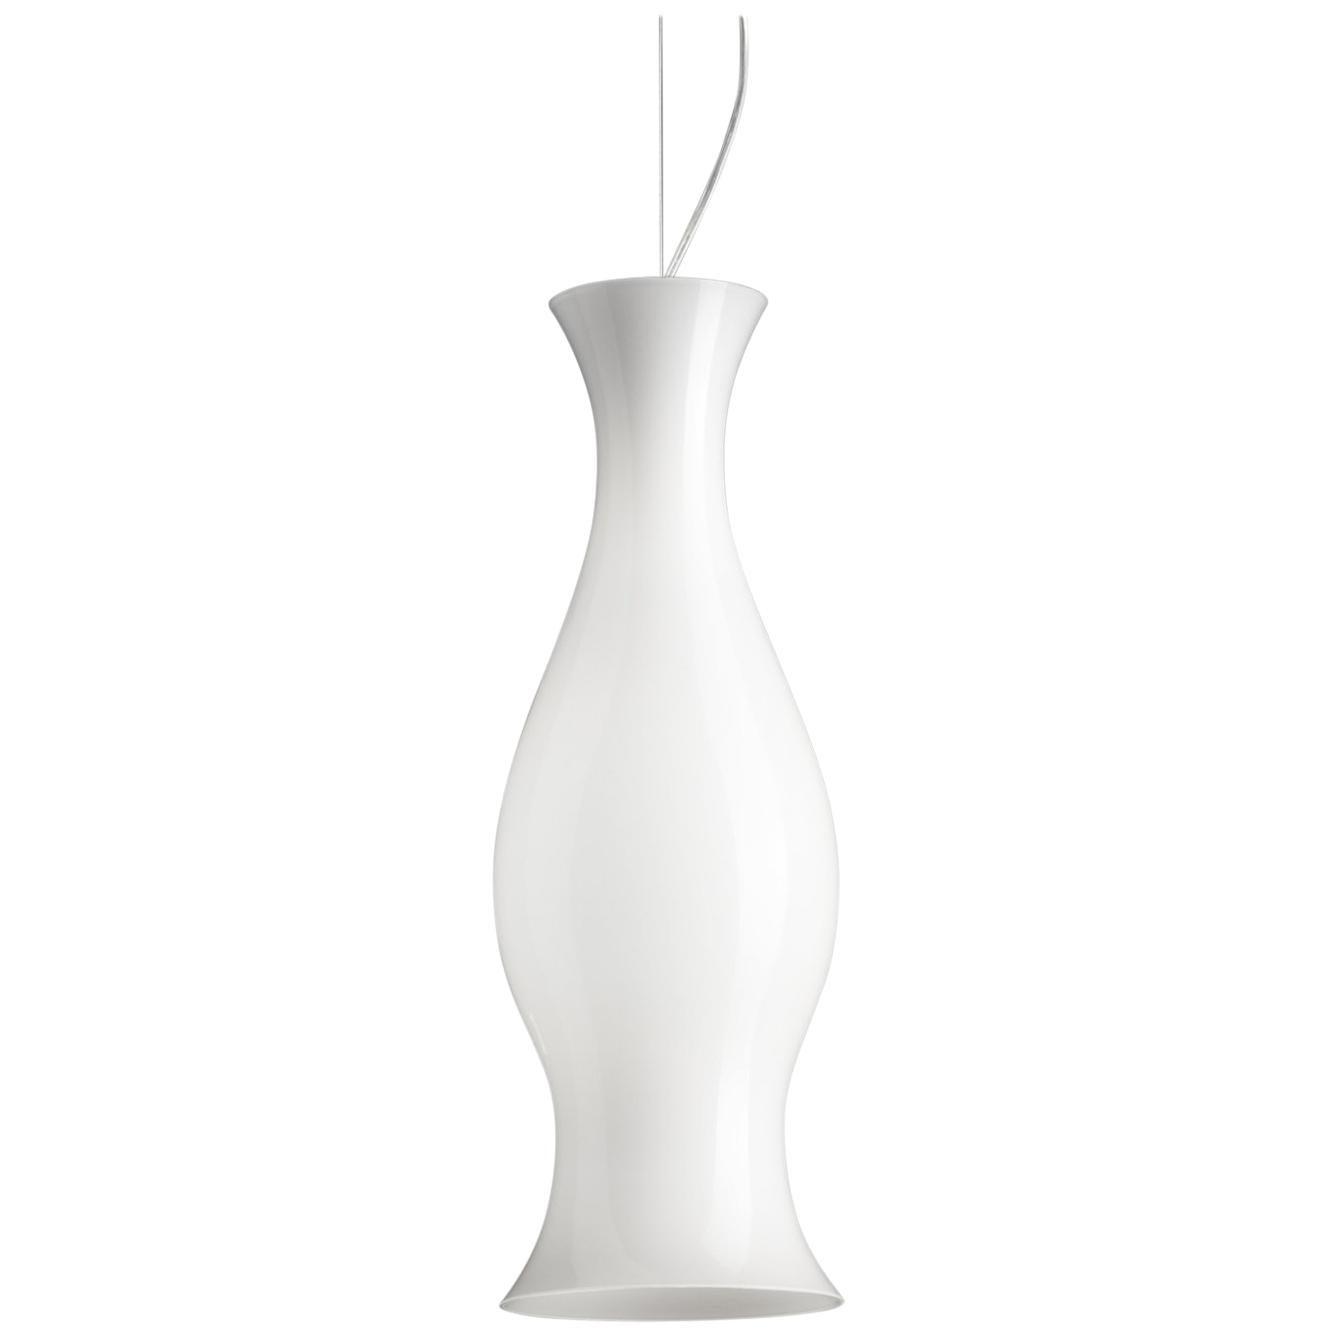 Leucos Spring S Pendant Light in Glossy White and Chrome by Eva Zeisel